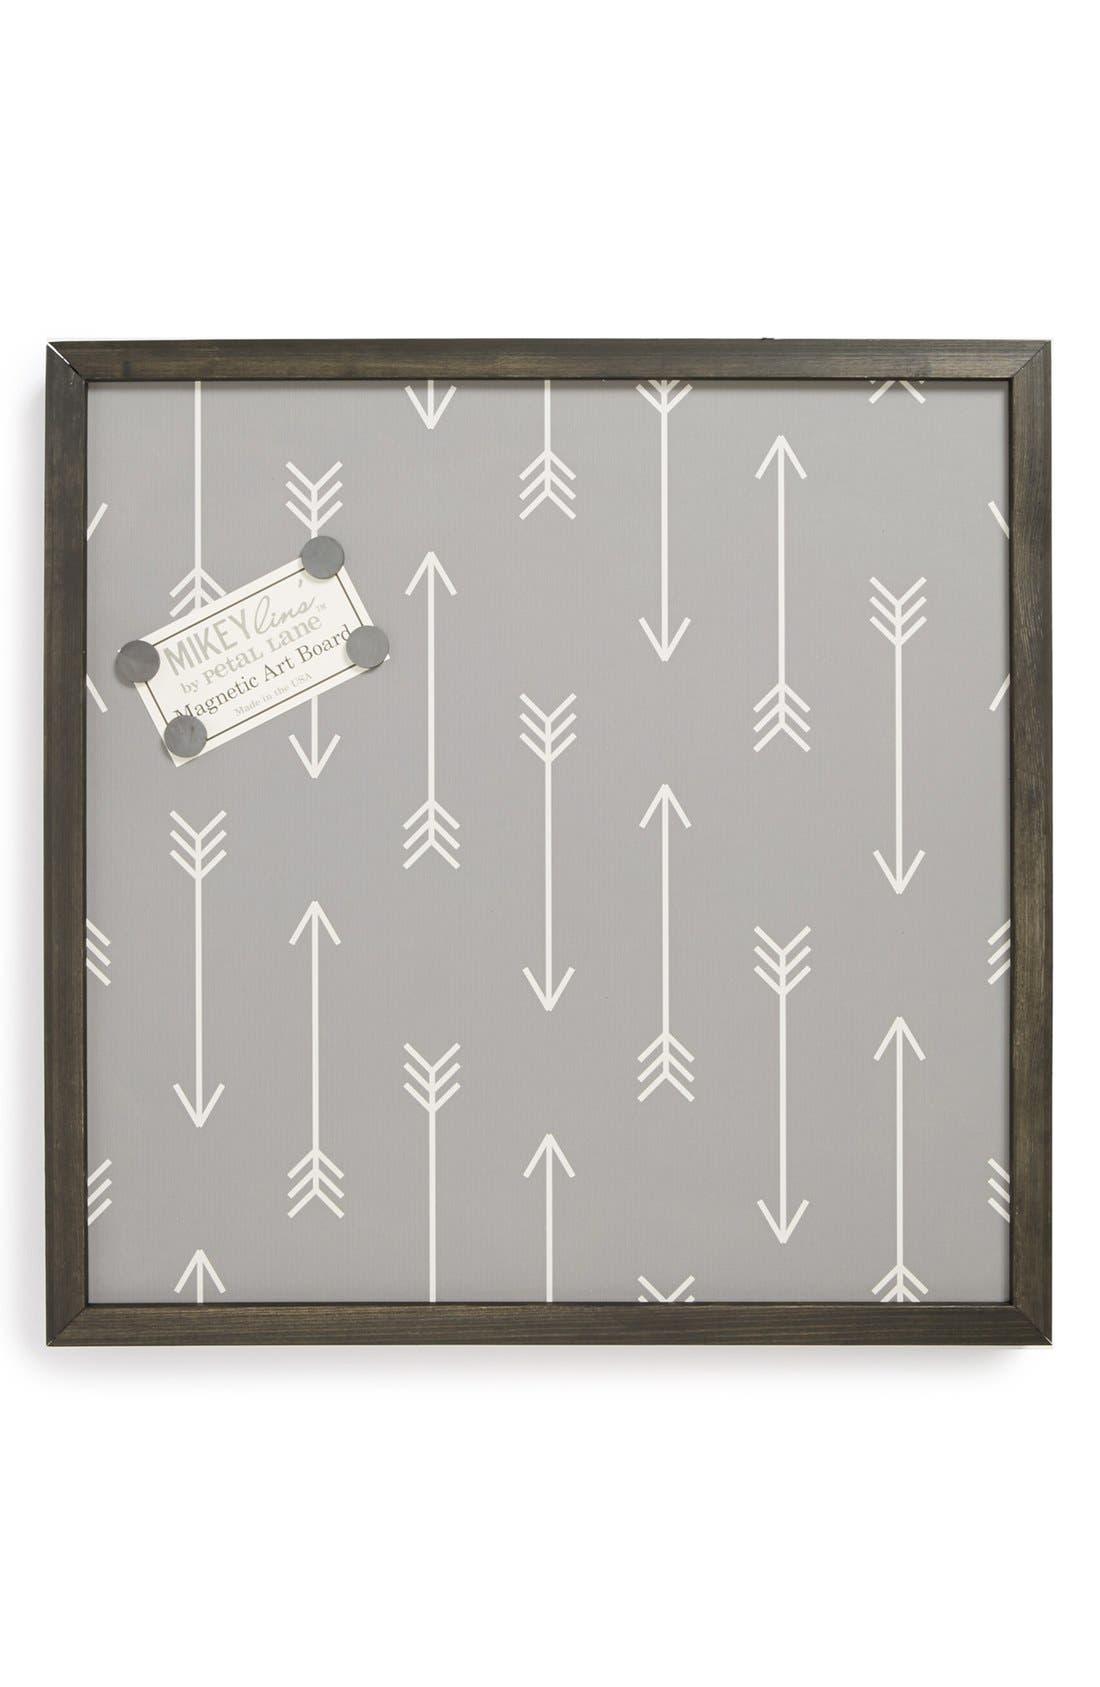 Alternate Image 1 Selected - Petal Lane 'Celebrate Life' Framed Magnet Art Board